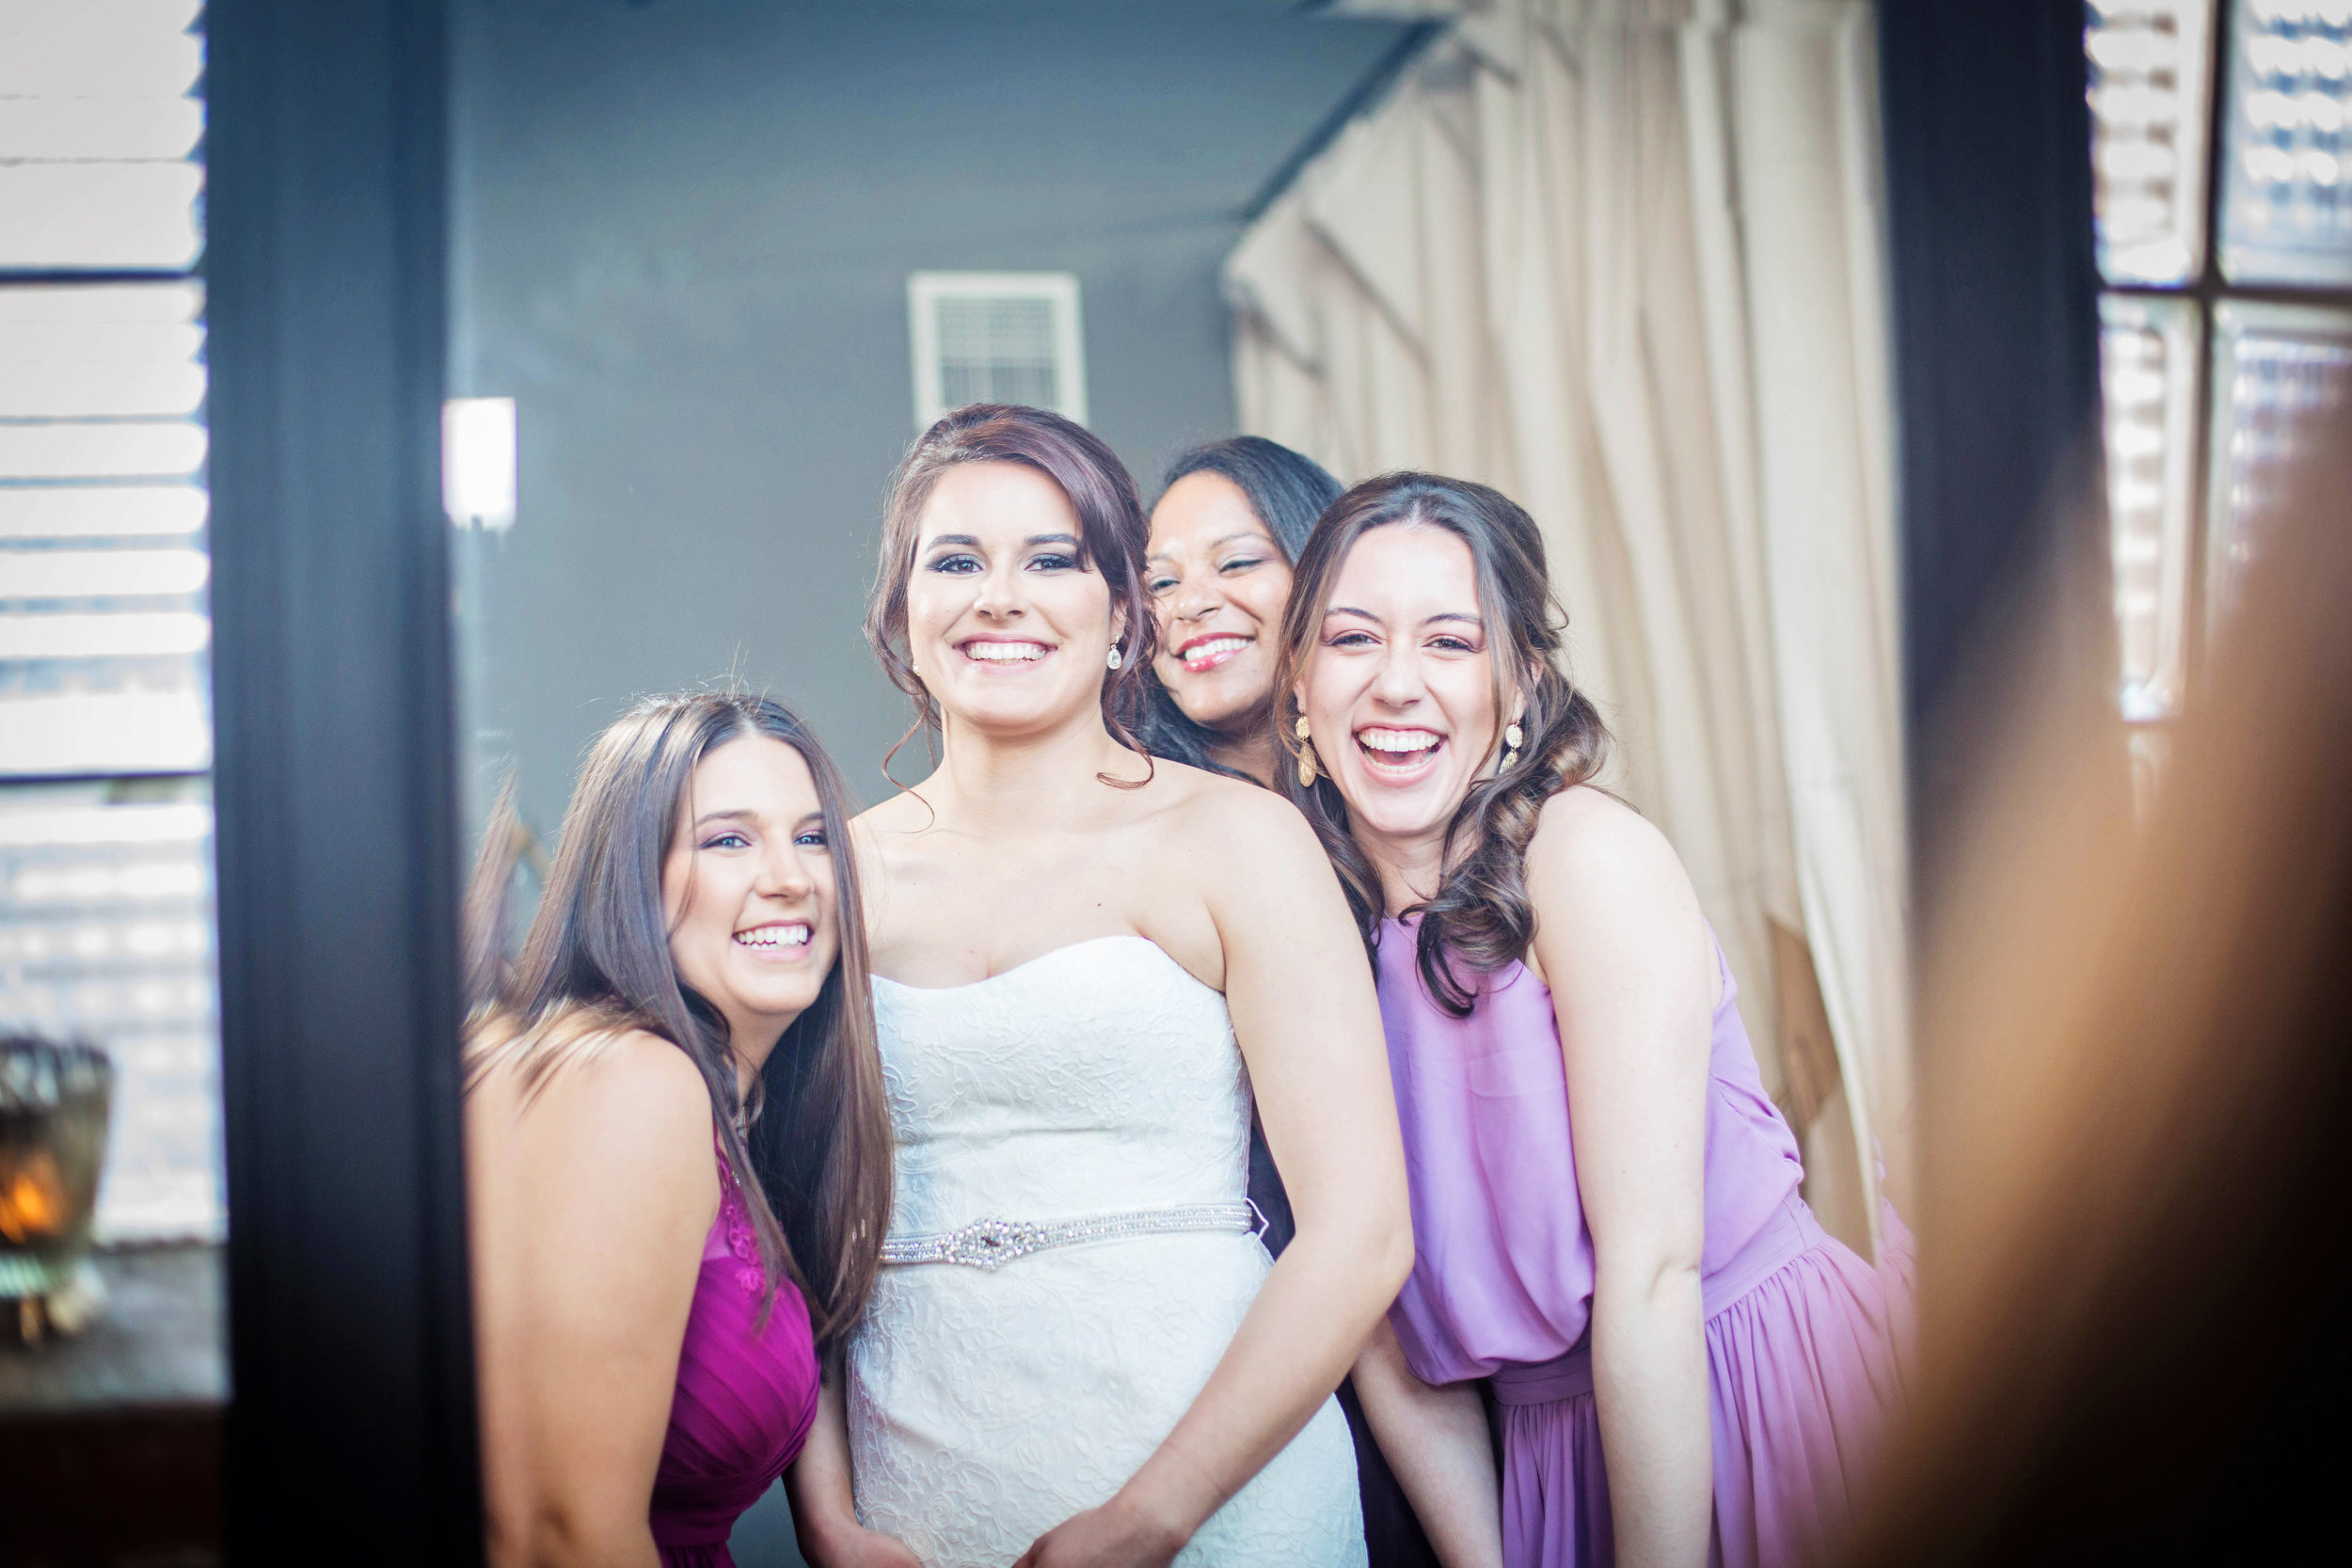 Kansas+City_Small+Wedding_Elope_Intimate_Ceremony_Best+Friends_Madeline&Dalaino-032b.jpg